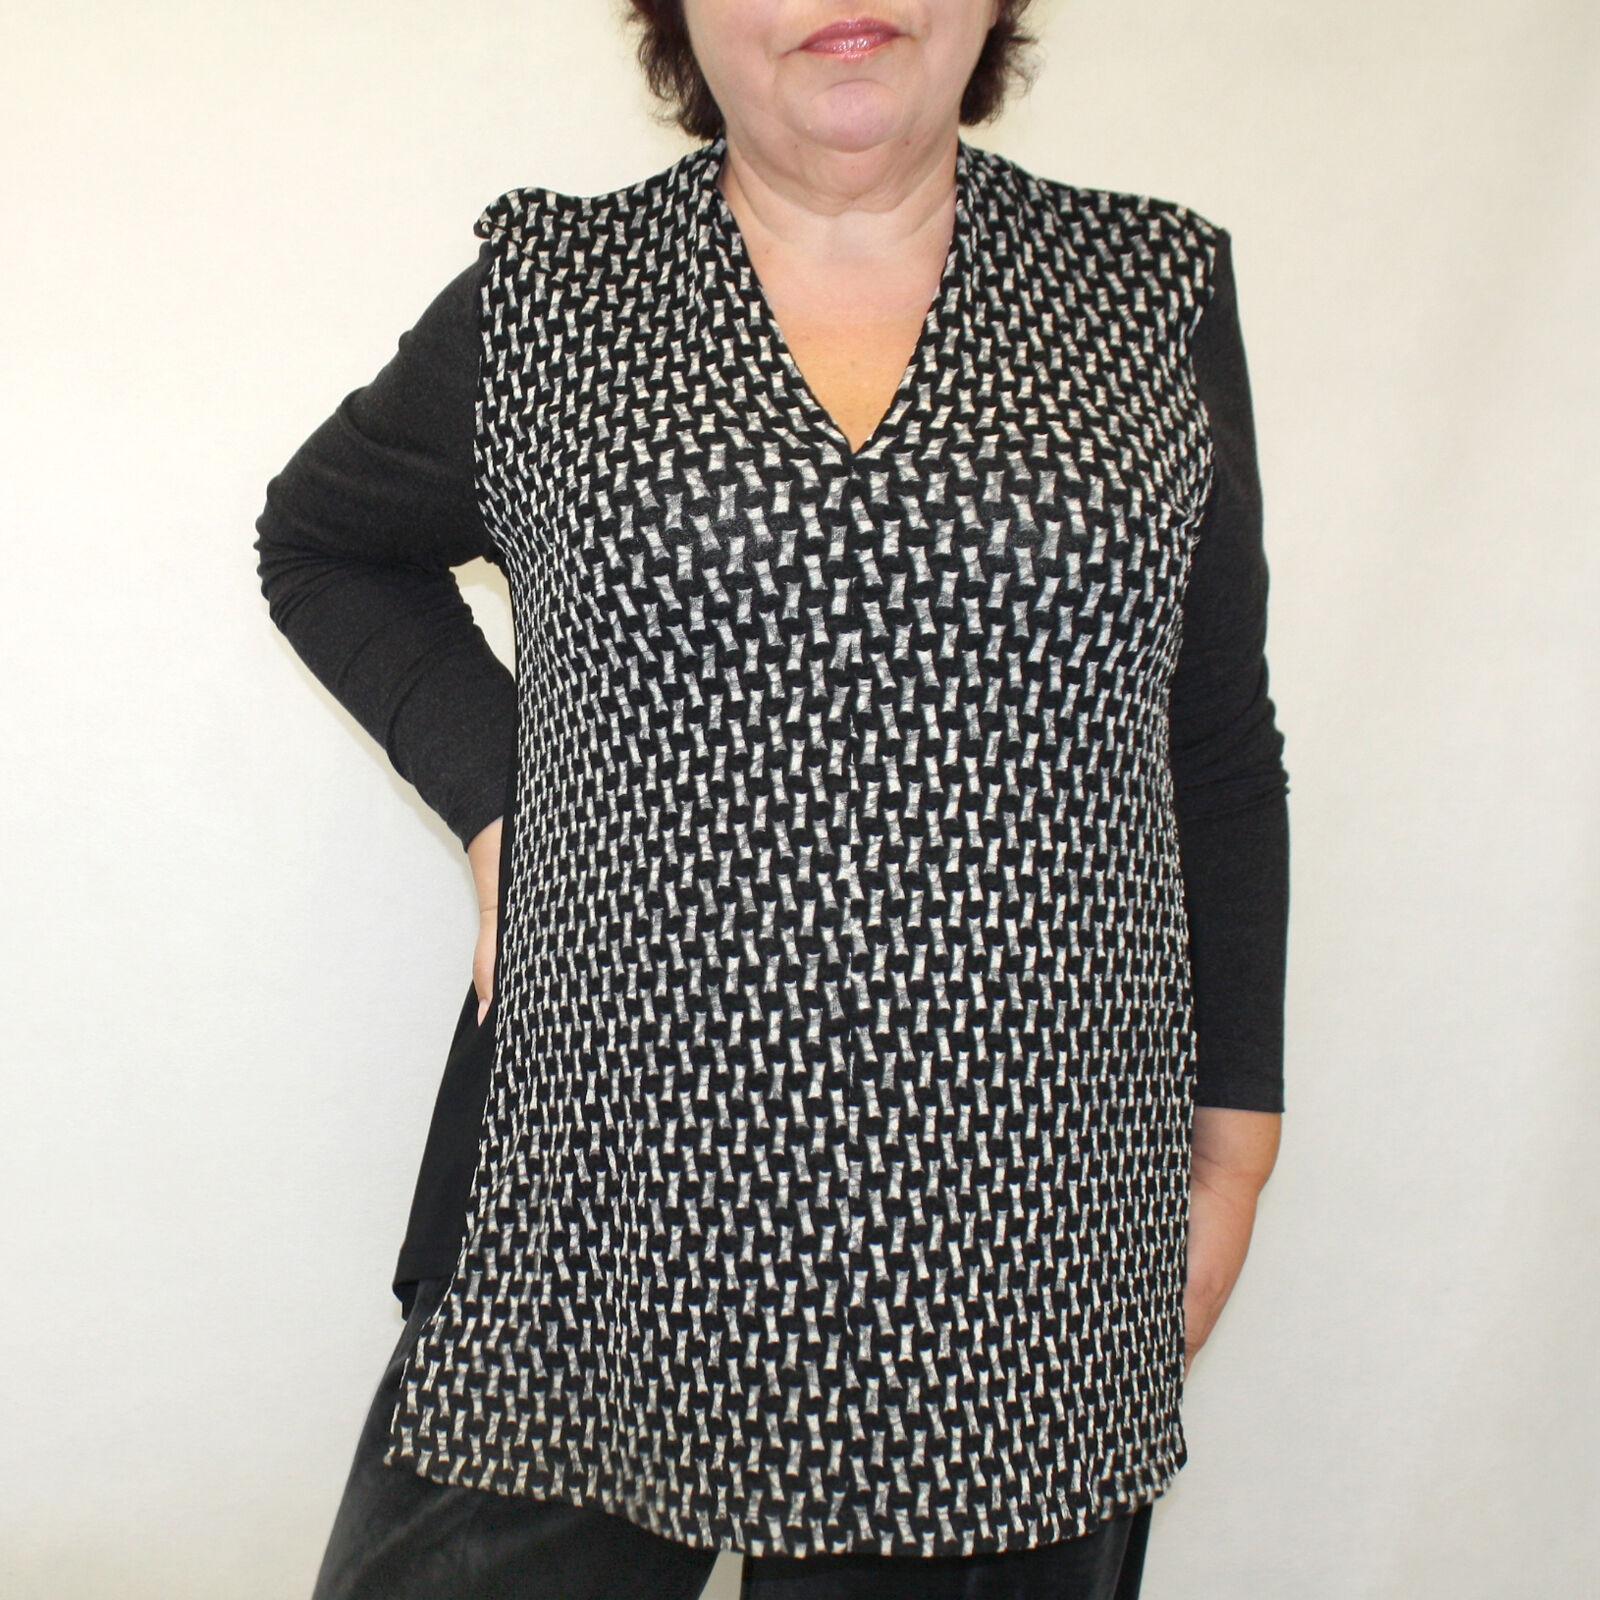 NEW  Alembika Lagenlook Plus Größe Stretchy schwarz Tunic Blouse Top 6 (XL, 1X)